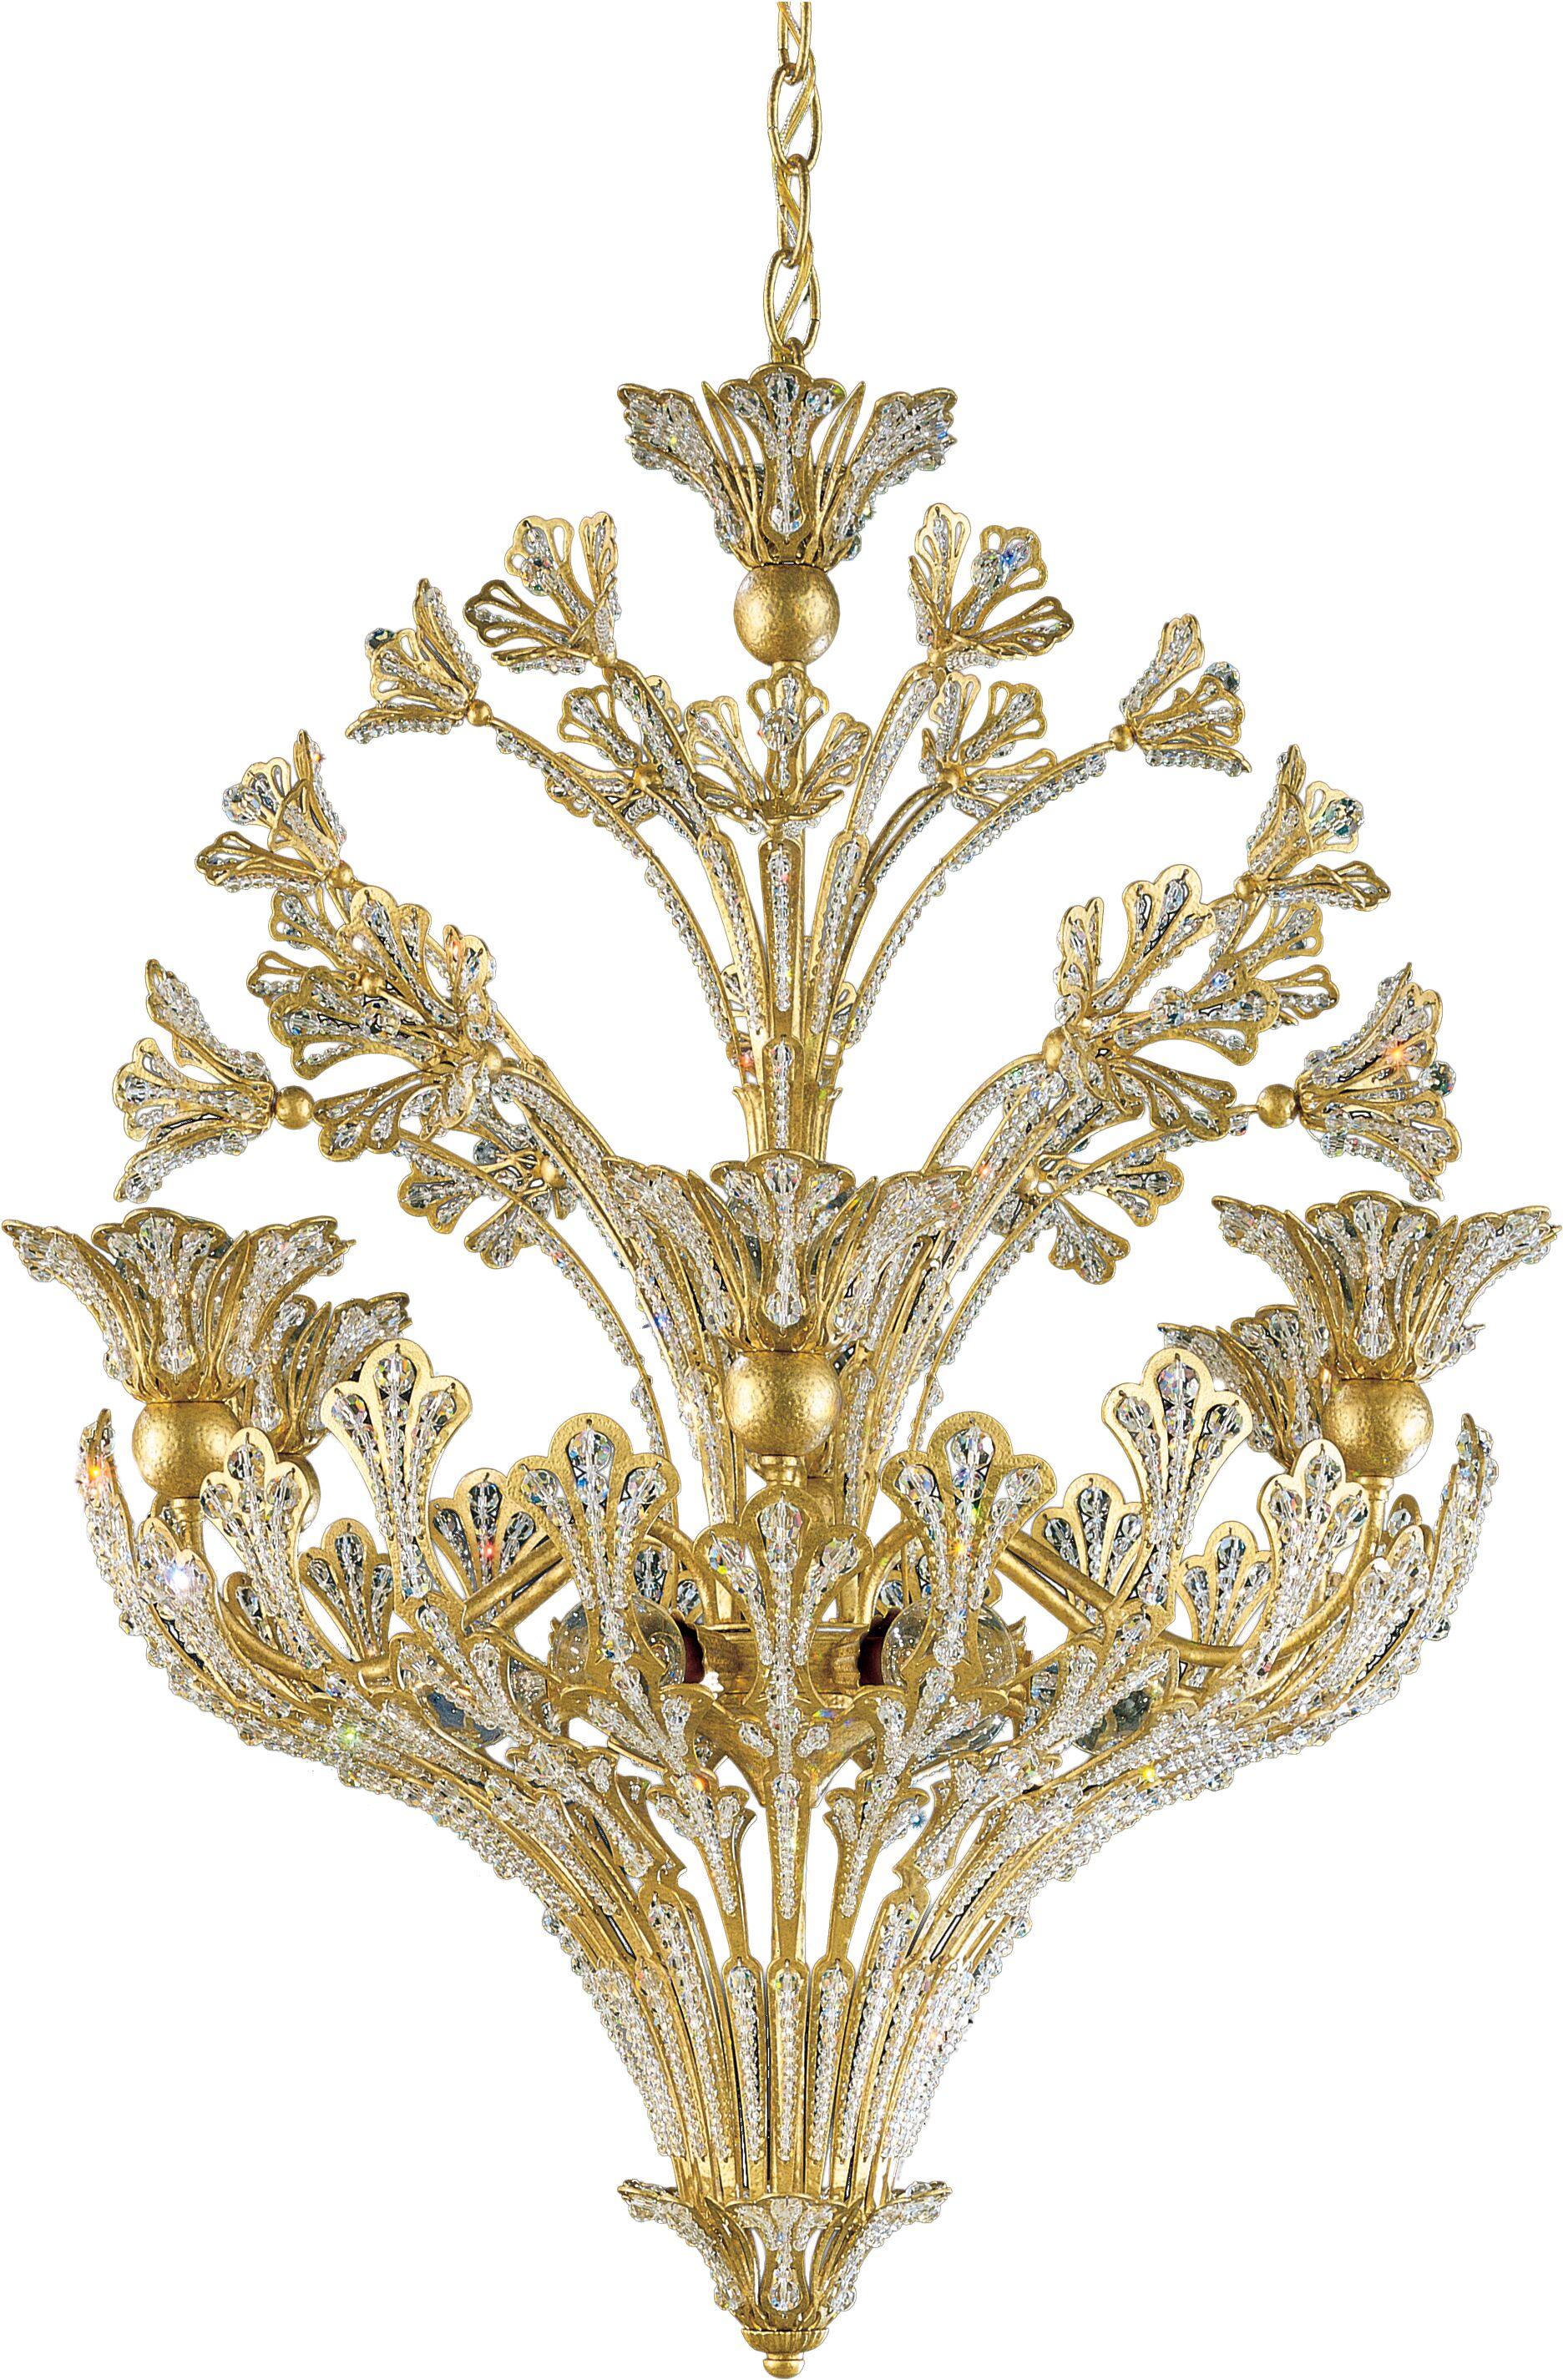 Rivendell 12-Light Crystal Chandelier Crystal: Spectra Clear, Finish: Heirloom Bronze